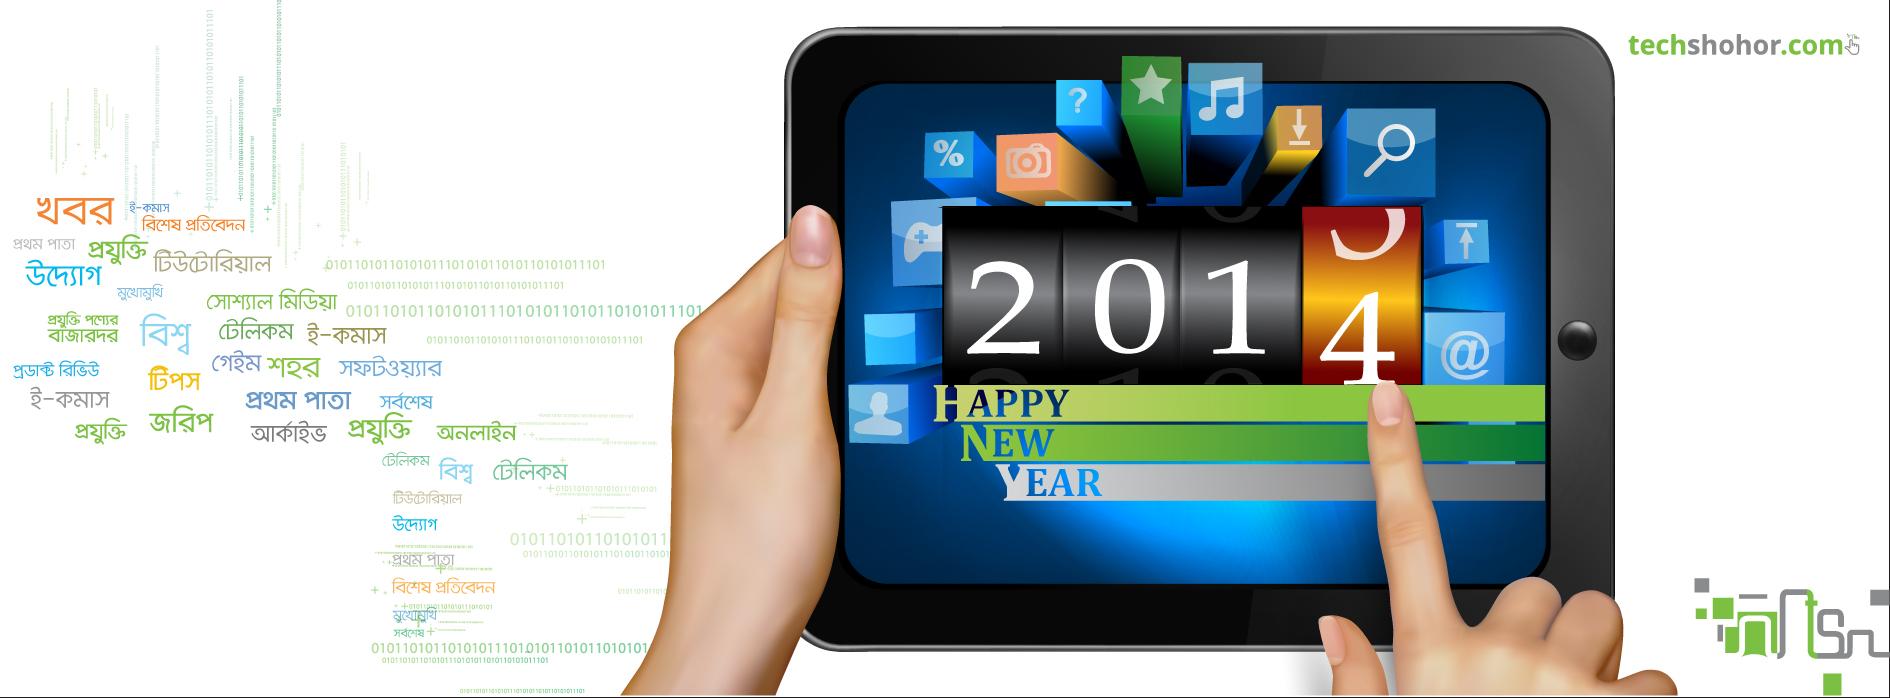 New Year-TechShohor